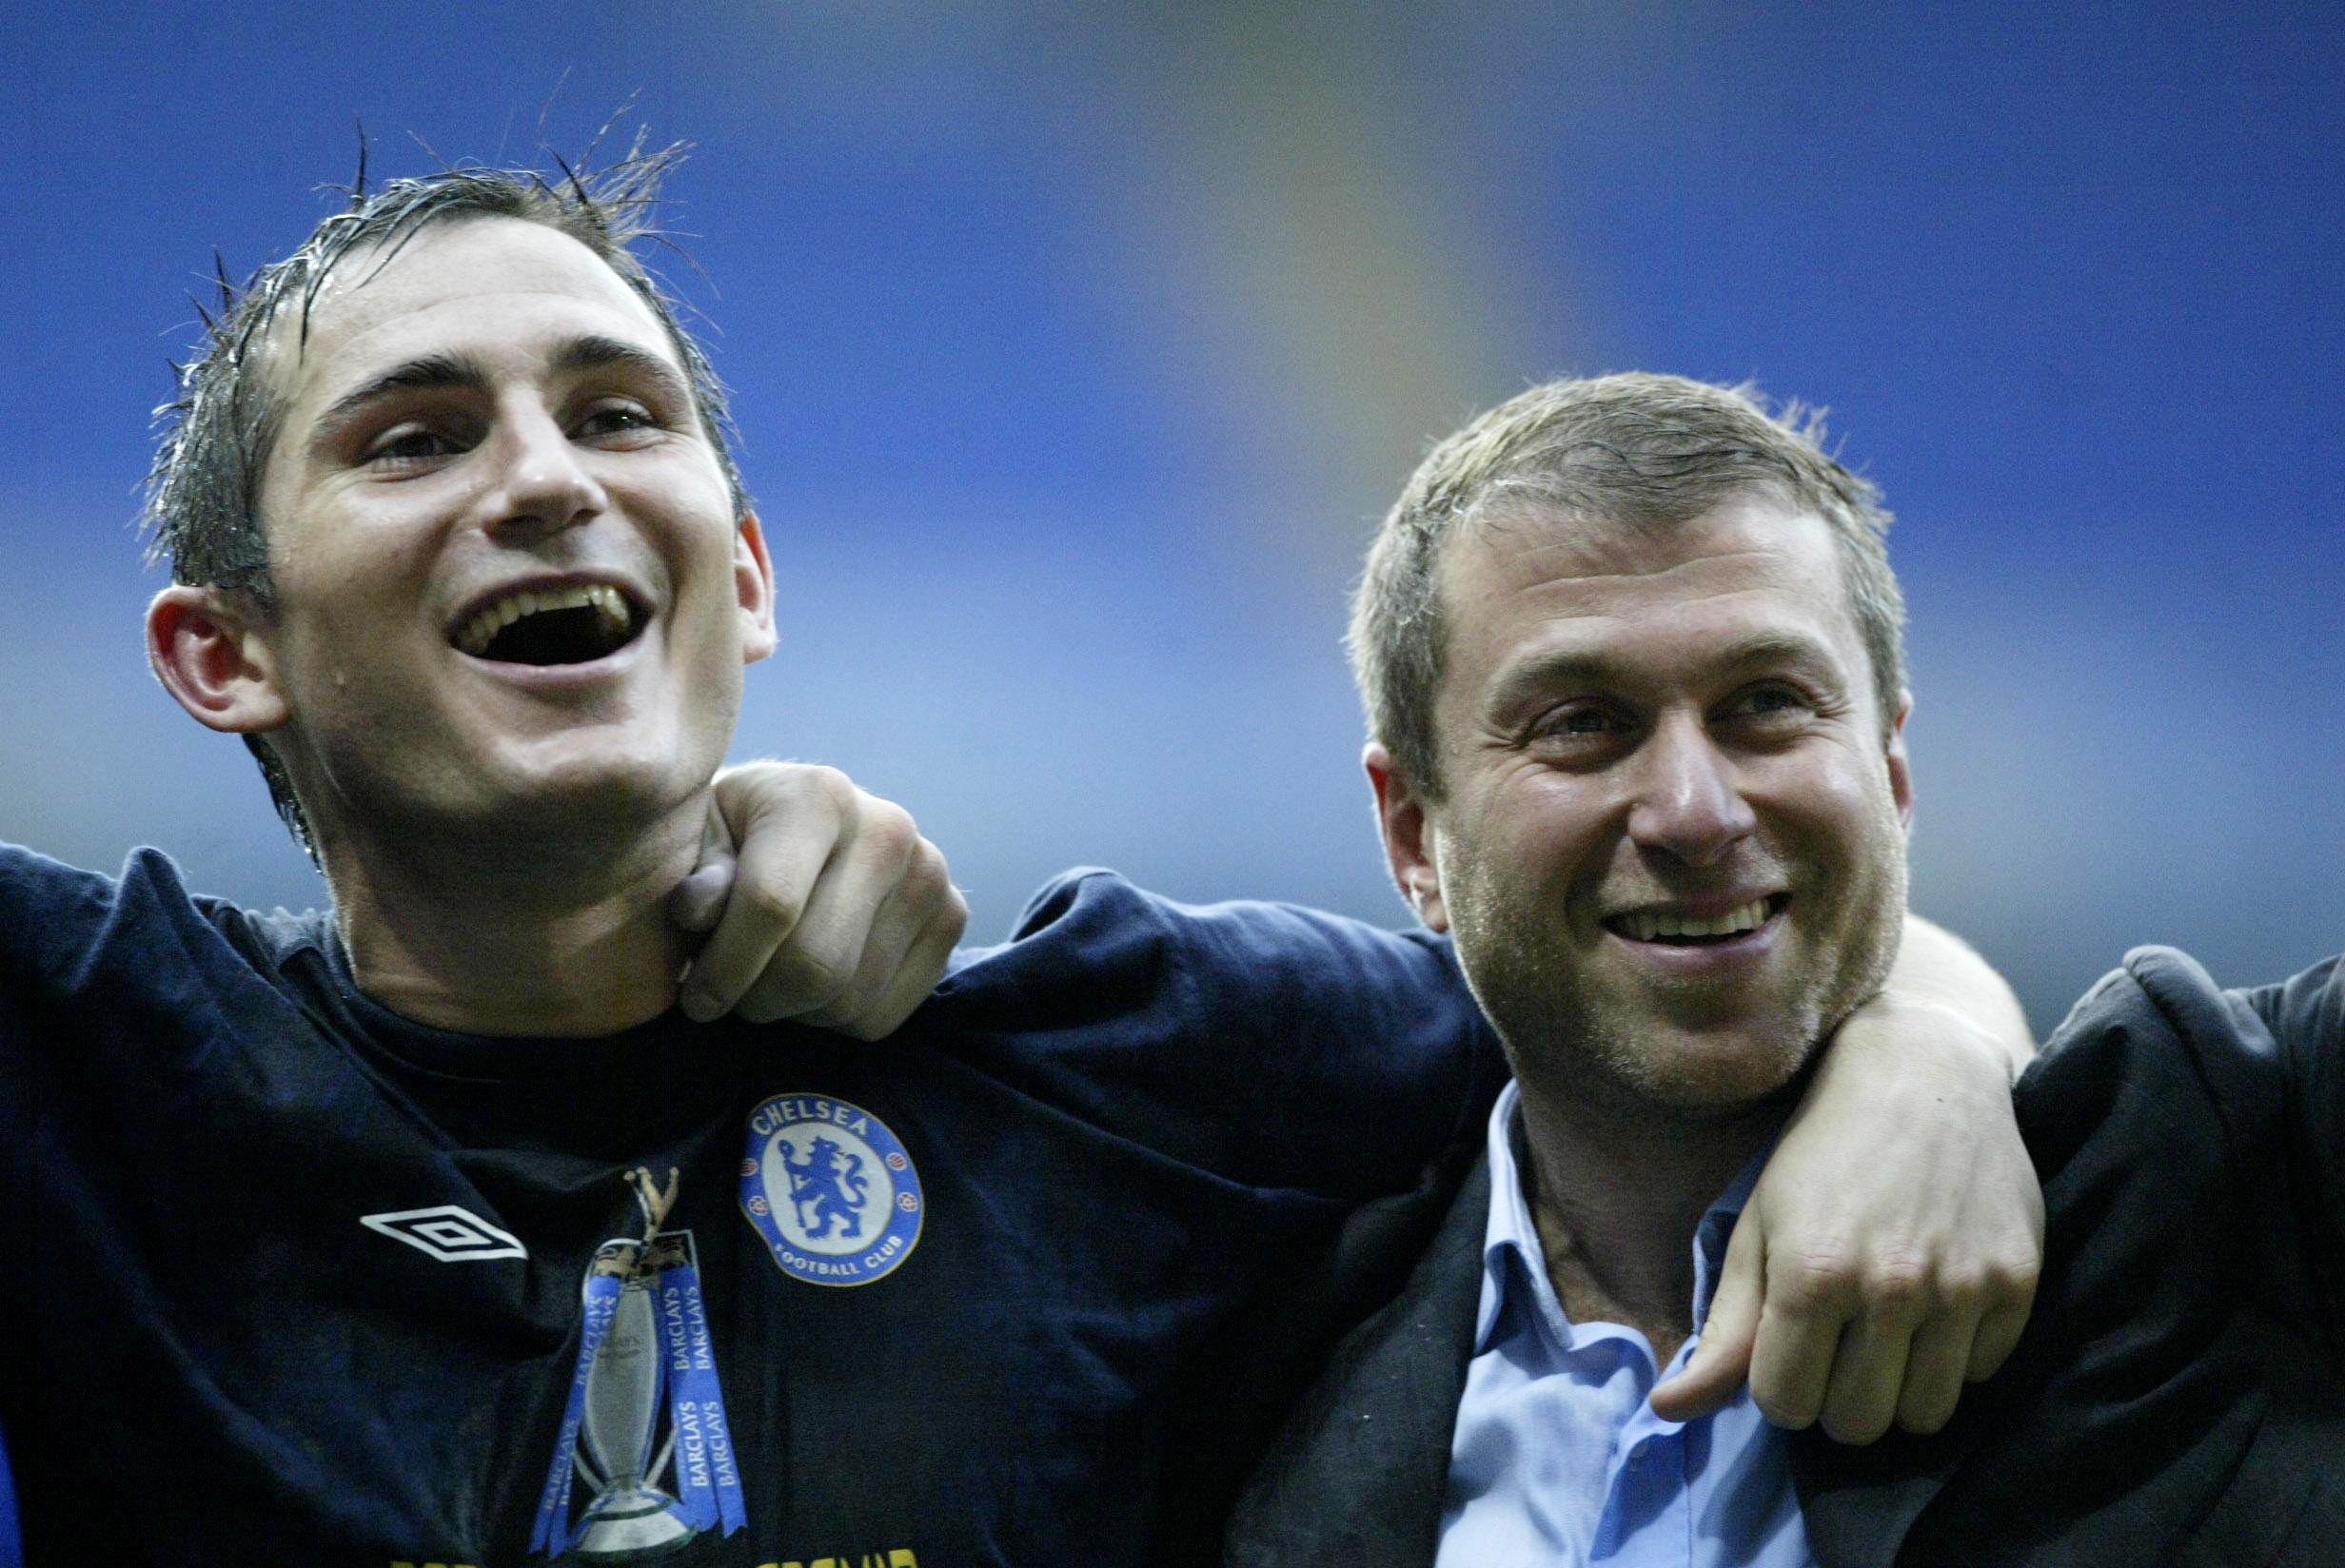 Soccer - FA Barclays Premiership - Bolton Wanderers v Chelsea - Reebok Stadium